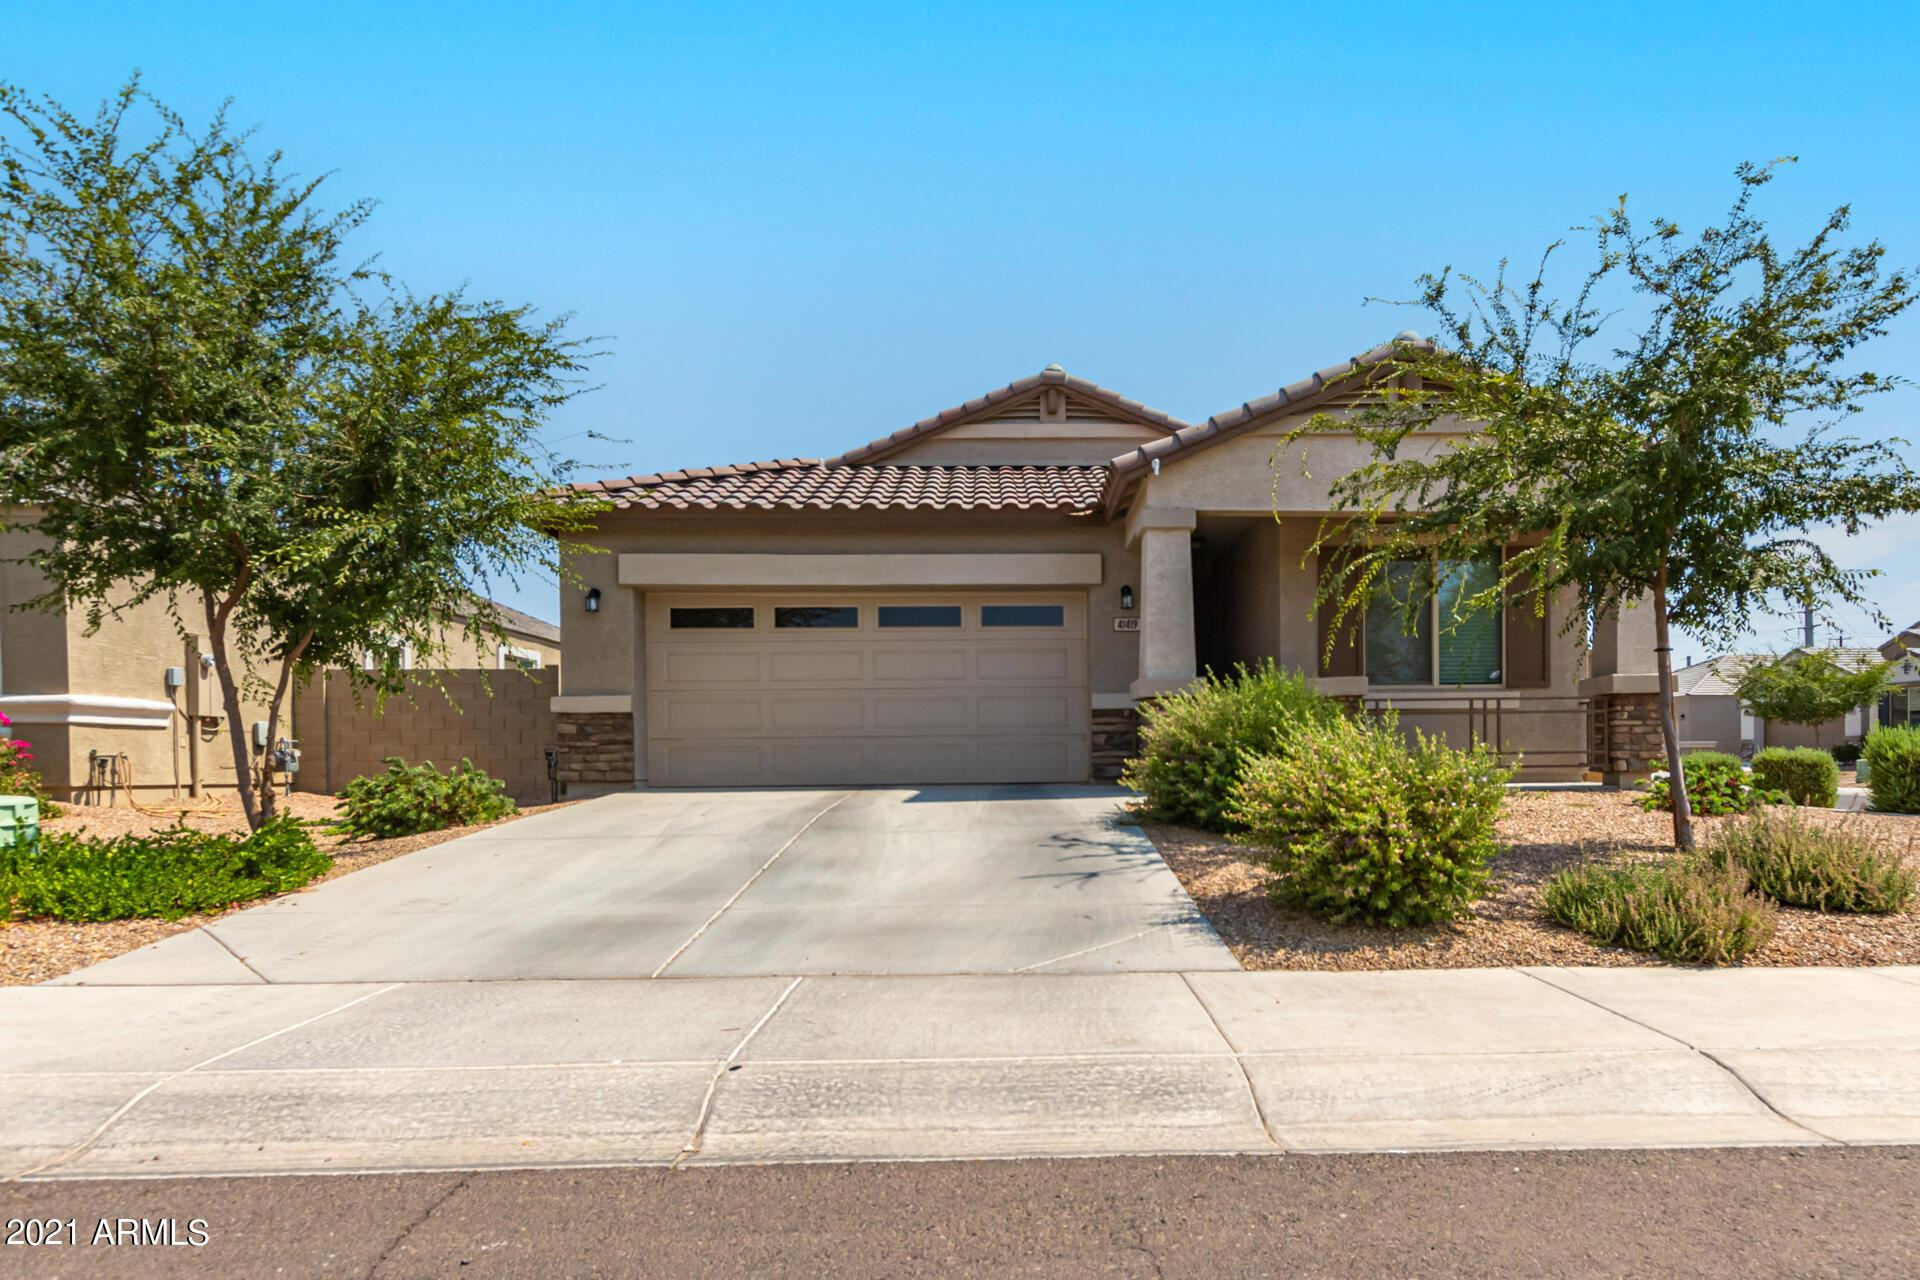 Photo for 41419 W CRANE Drive, Maricopa, AZ 85138 (MLS # 6252752)